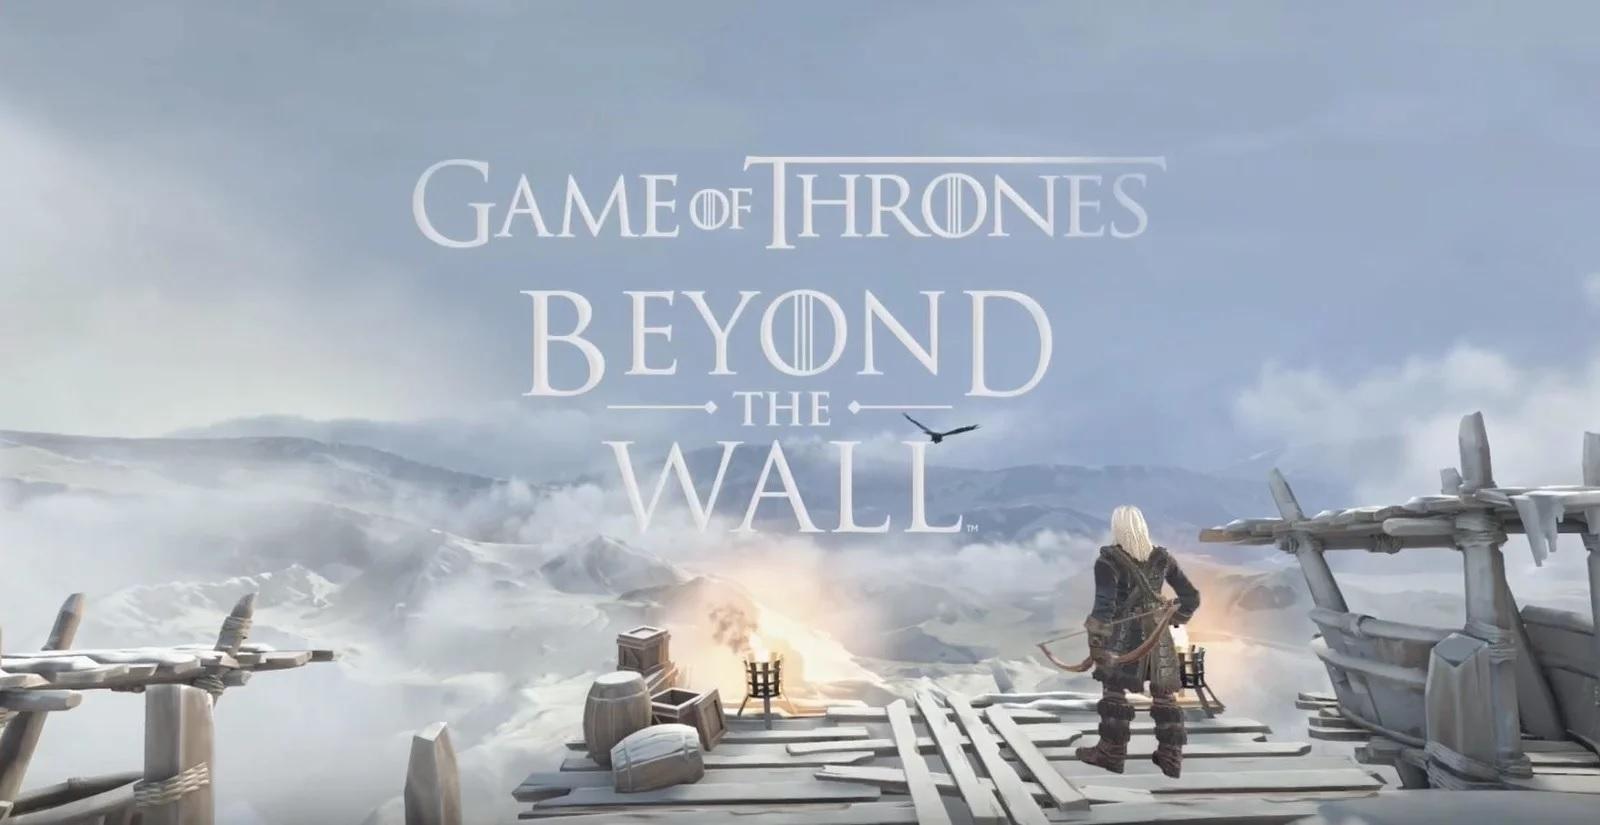 Game of thrones BTW